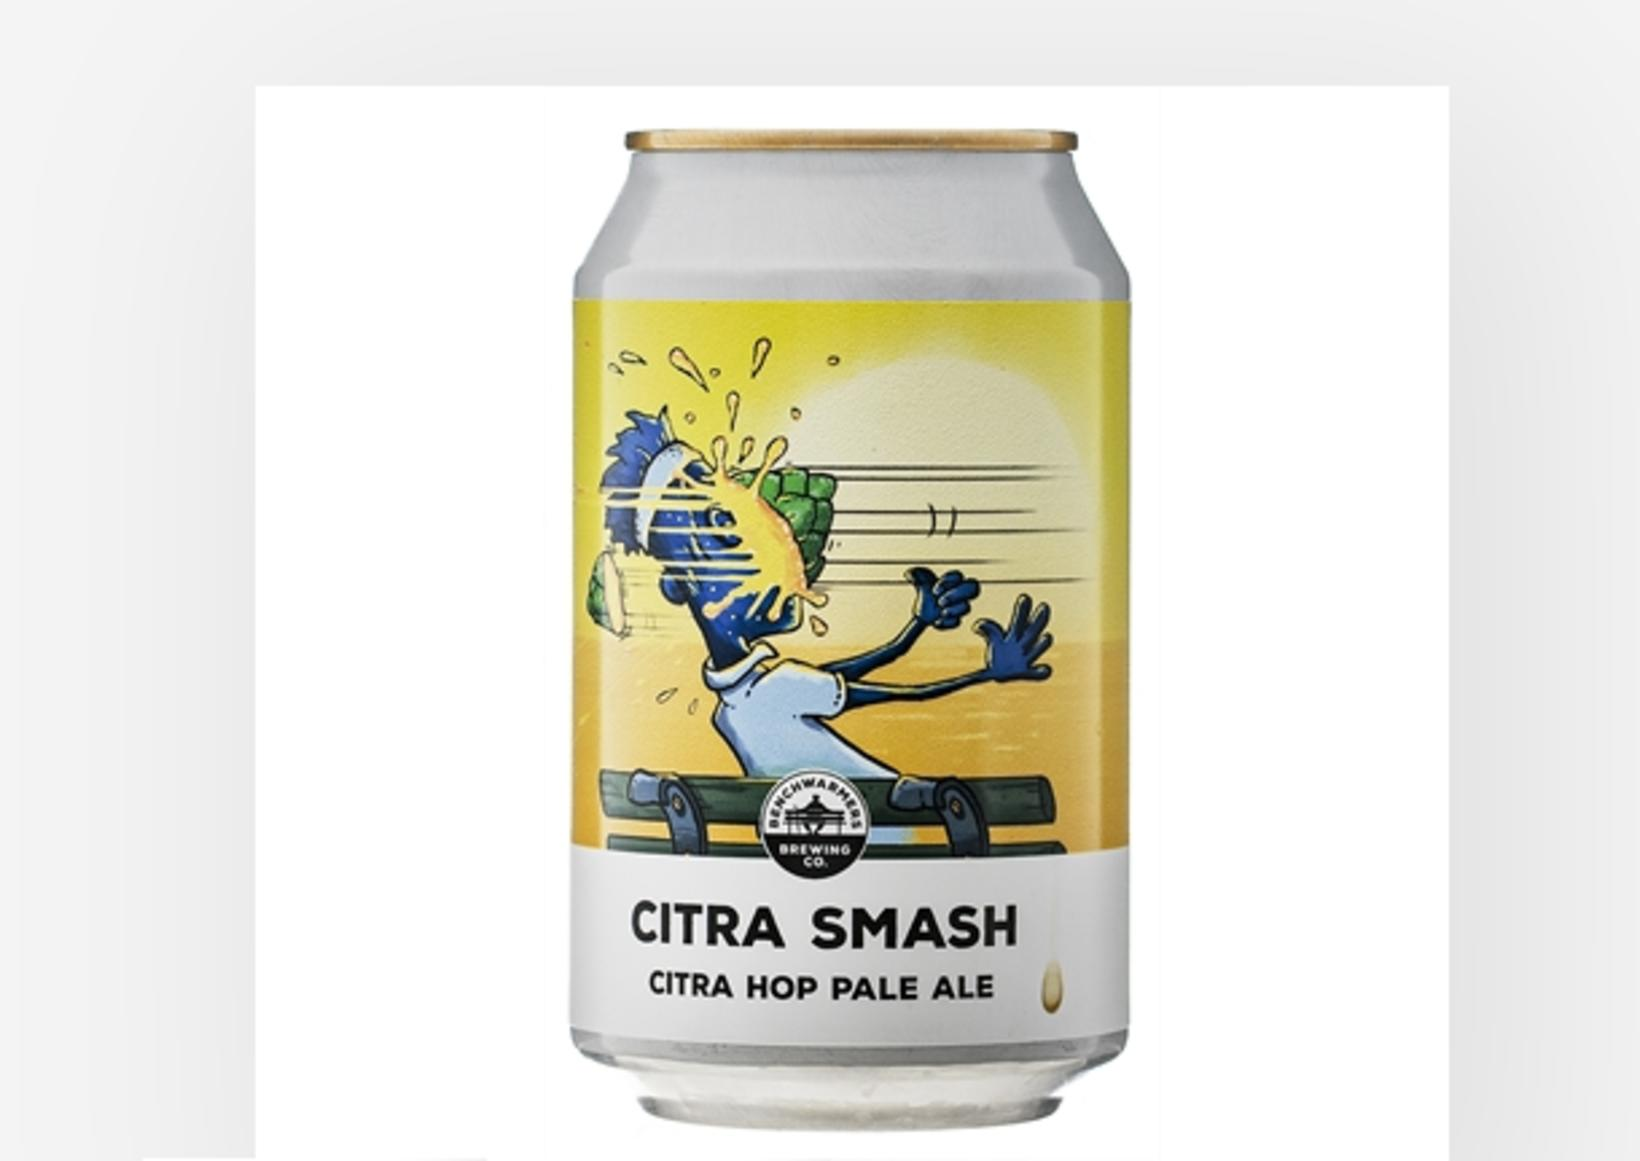 Benchwarmers Citra Smash.